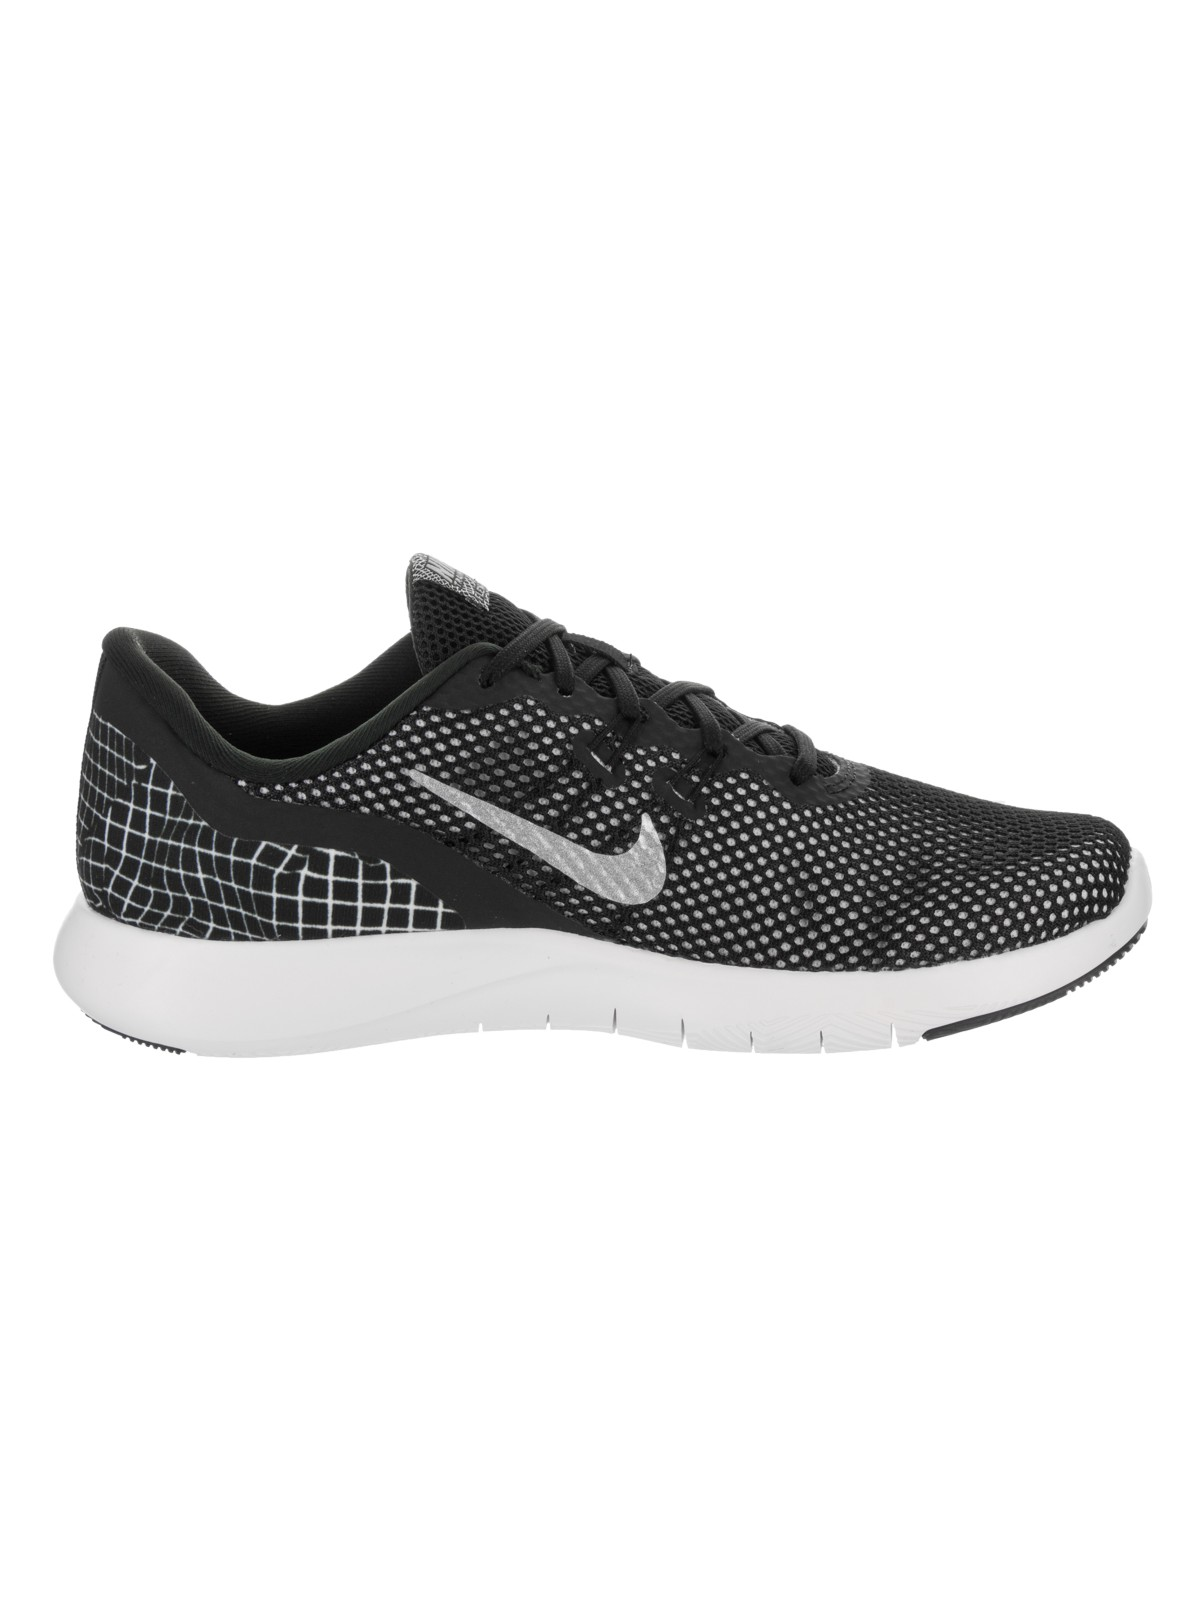 Gentlemen/Ladies-Nike Women's Flex Trainer 7 practical Print Training Shoe-most practical 7 2a9f01